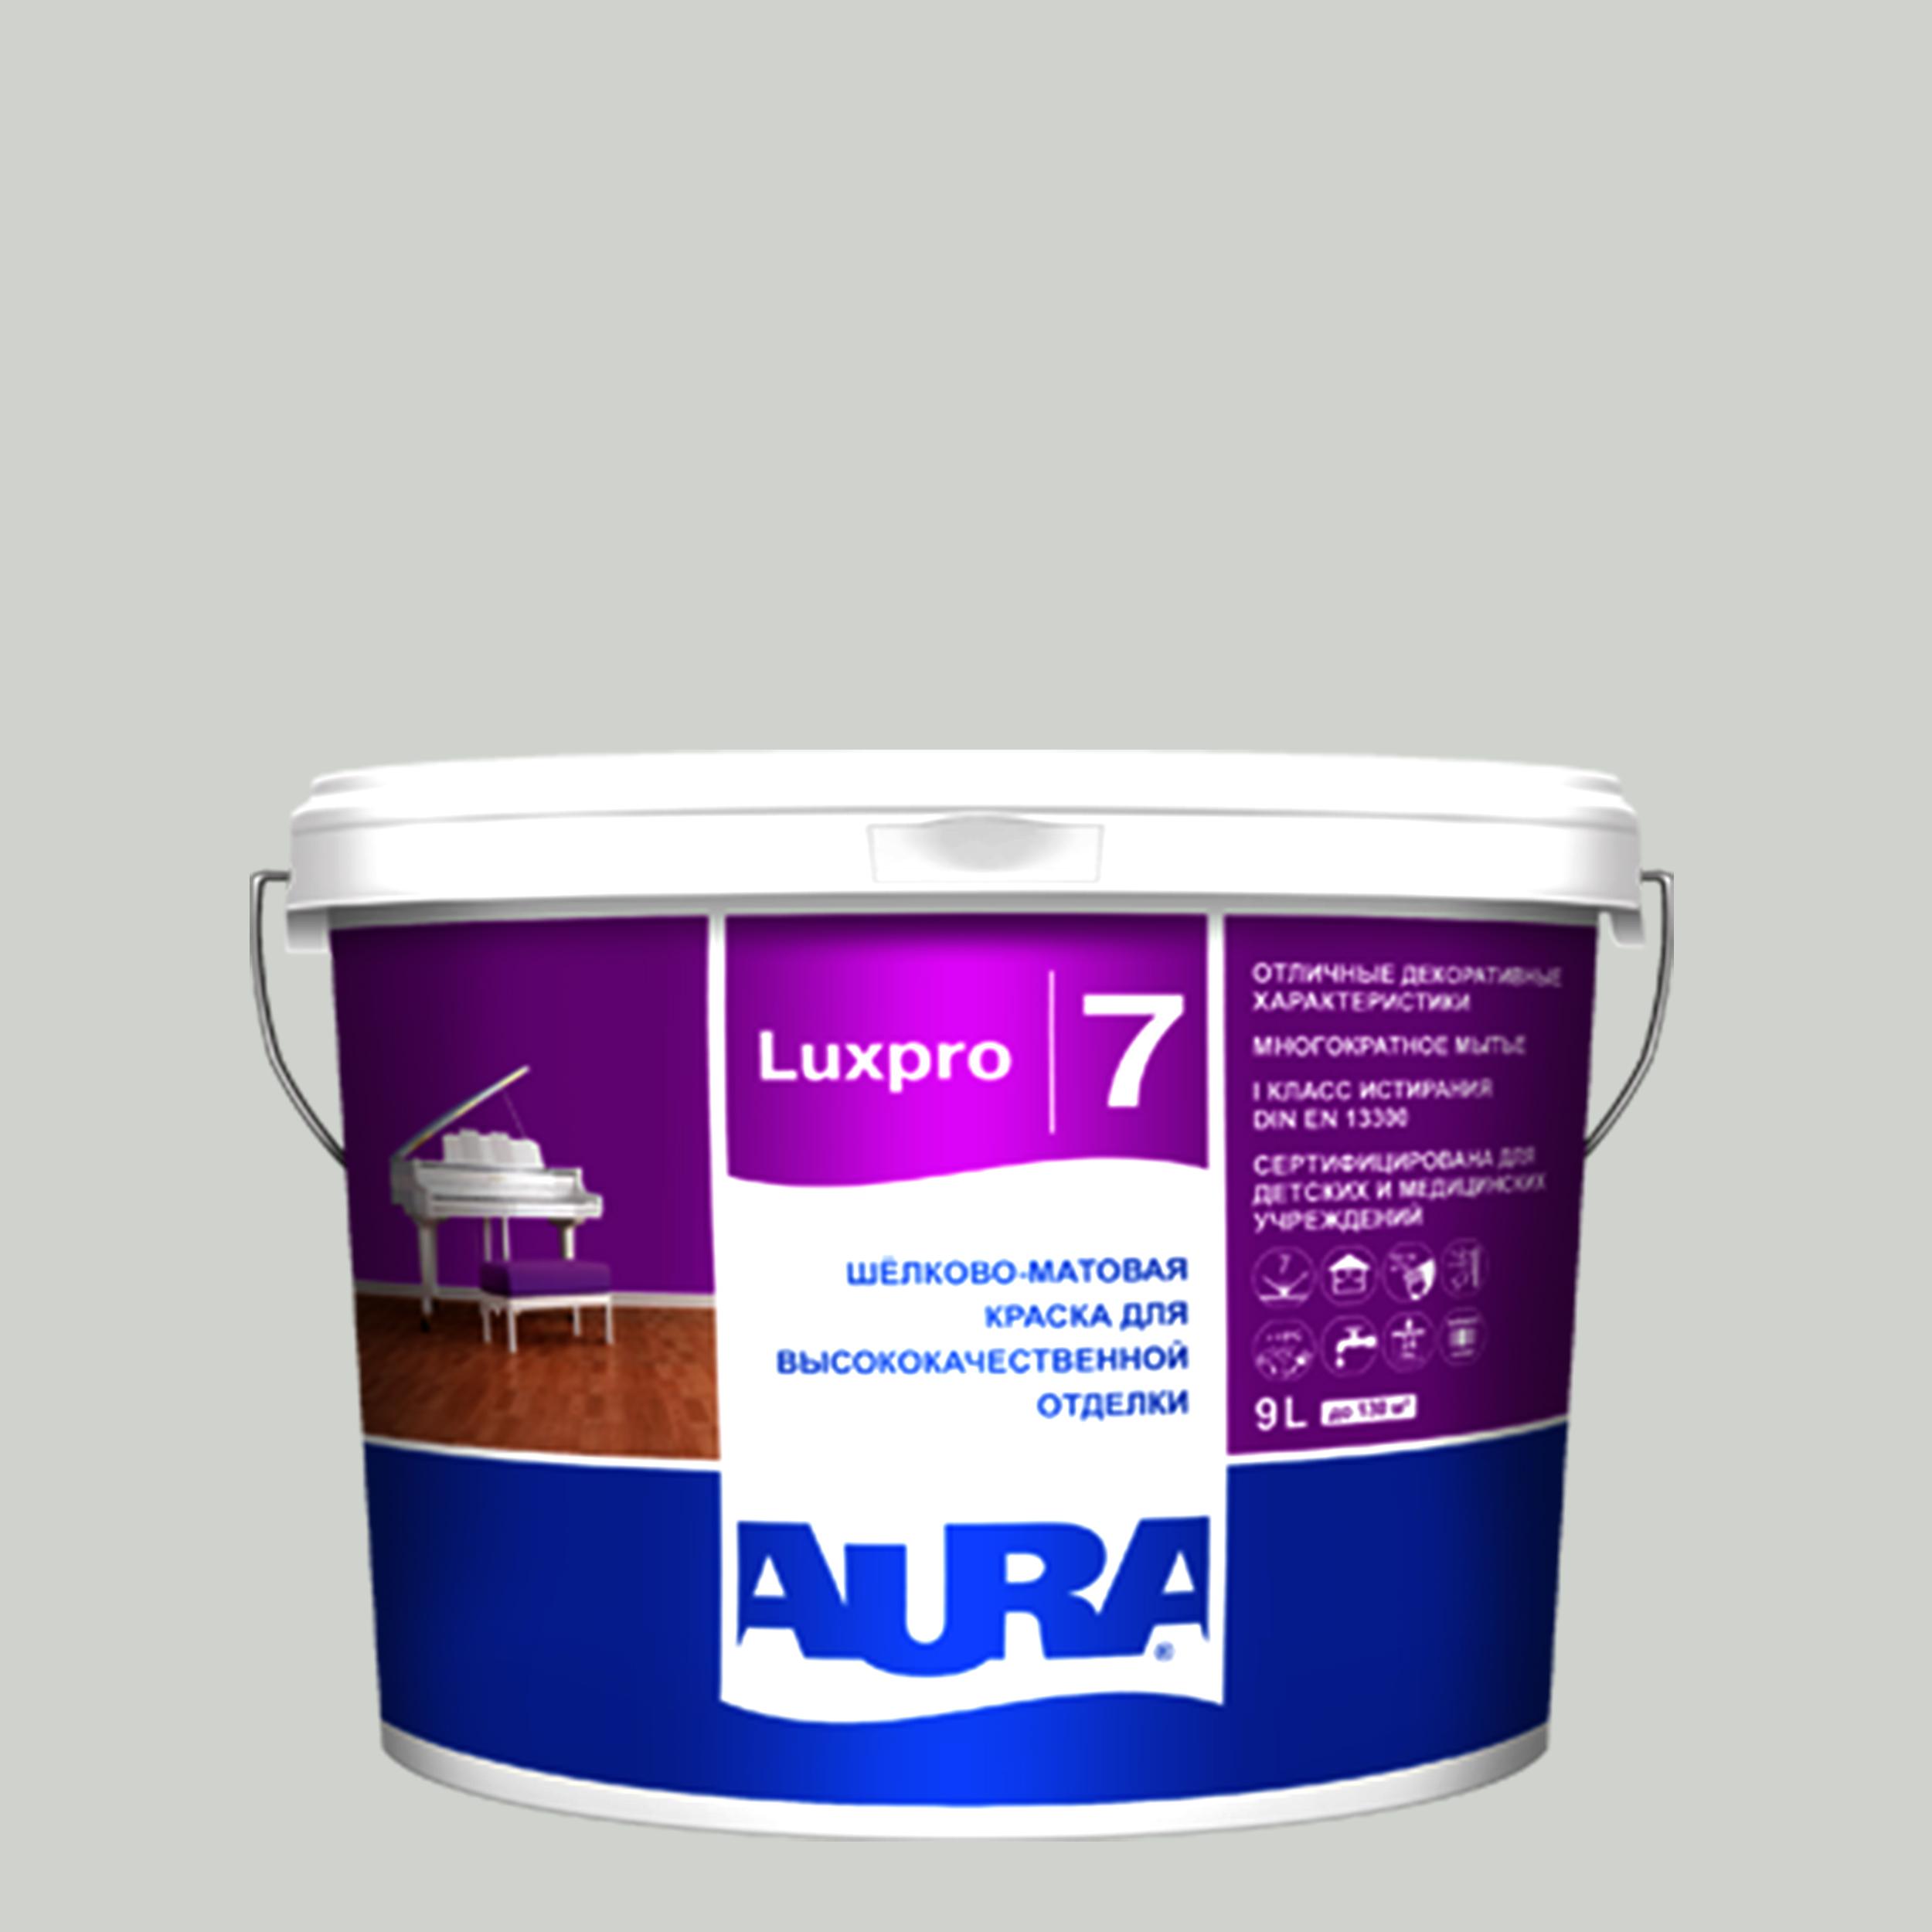 Фото 5 - Краска интерьерная, Aura LuxPRO 7, RAL 5017, 11 кг.